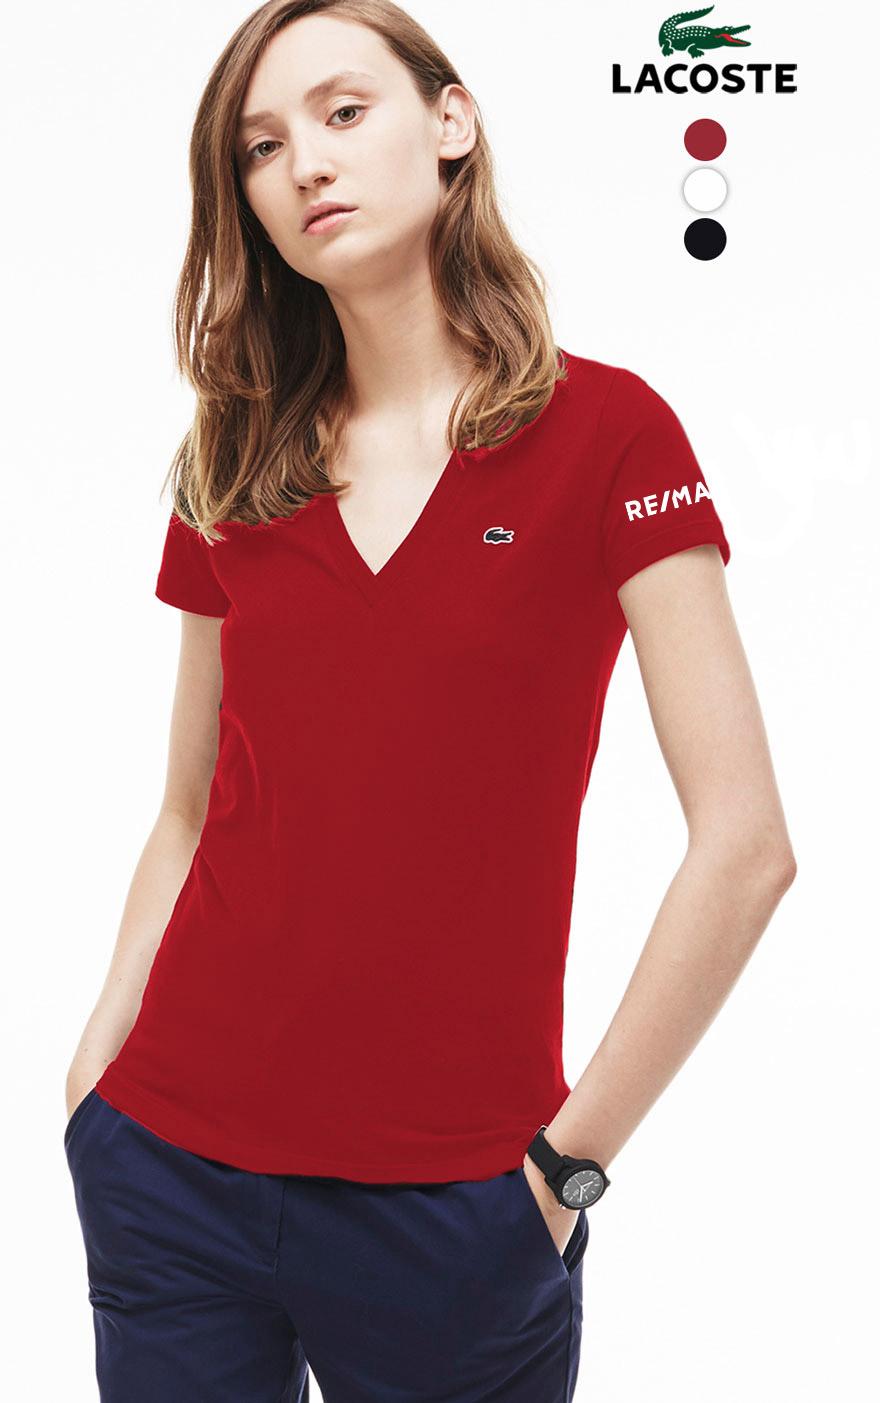 08ba1a730c Lacoste Women's T-Shirt